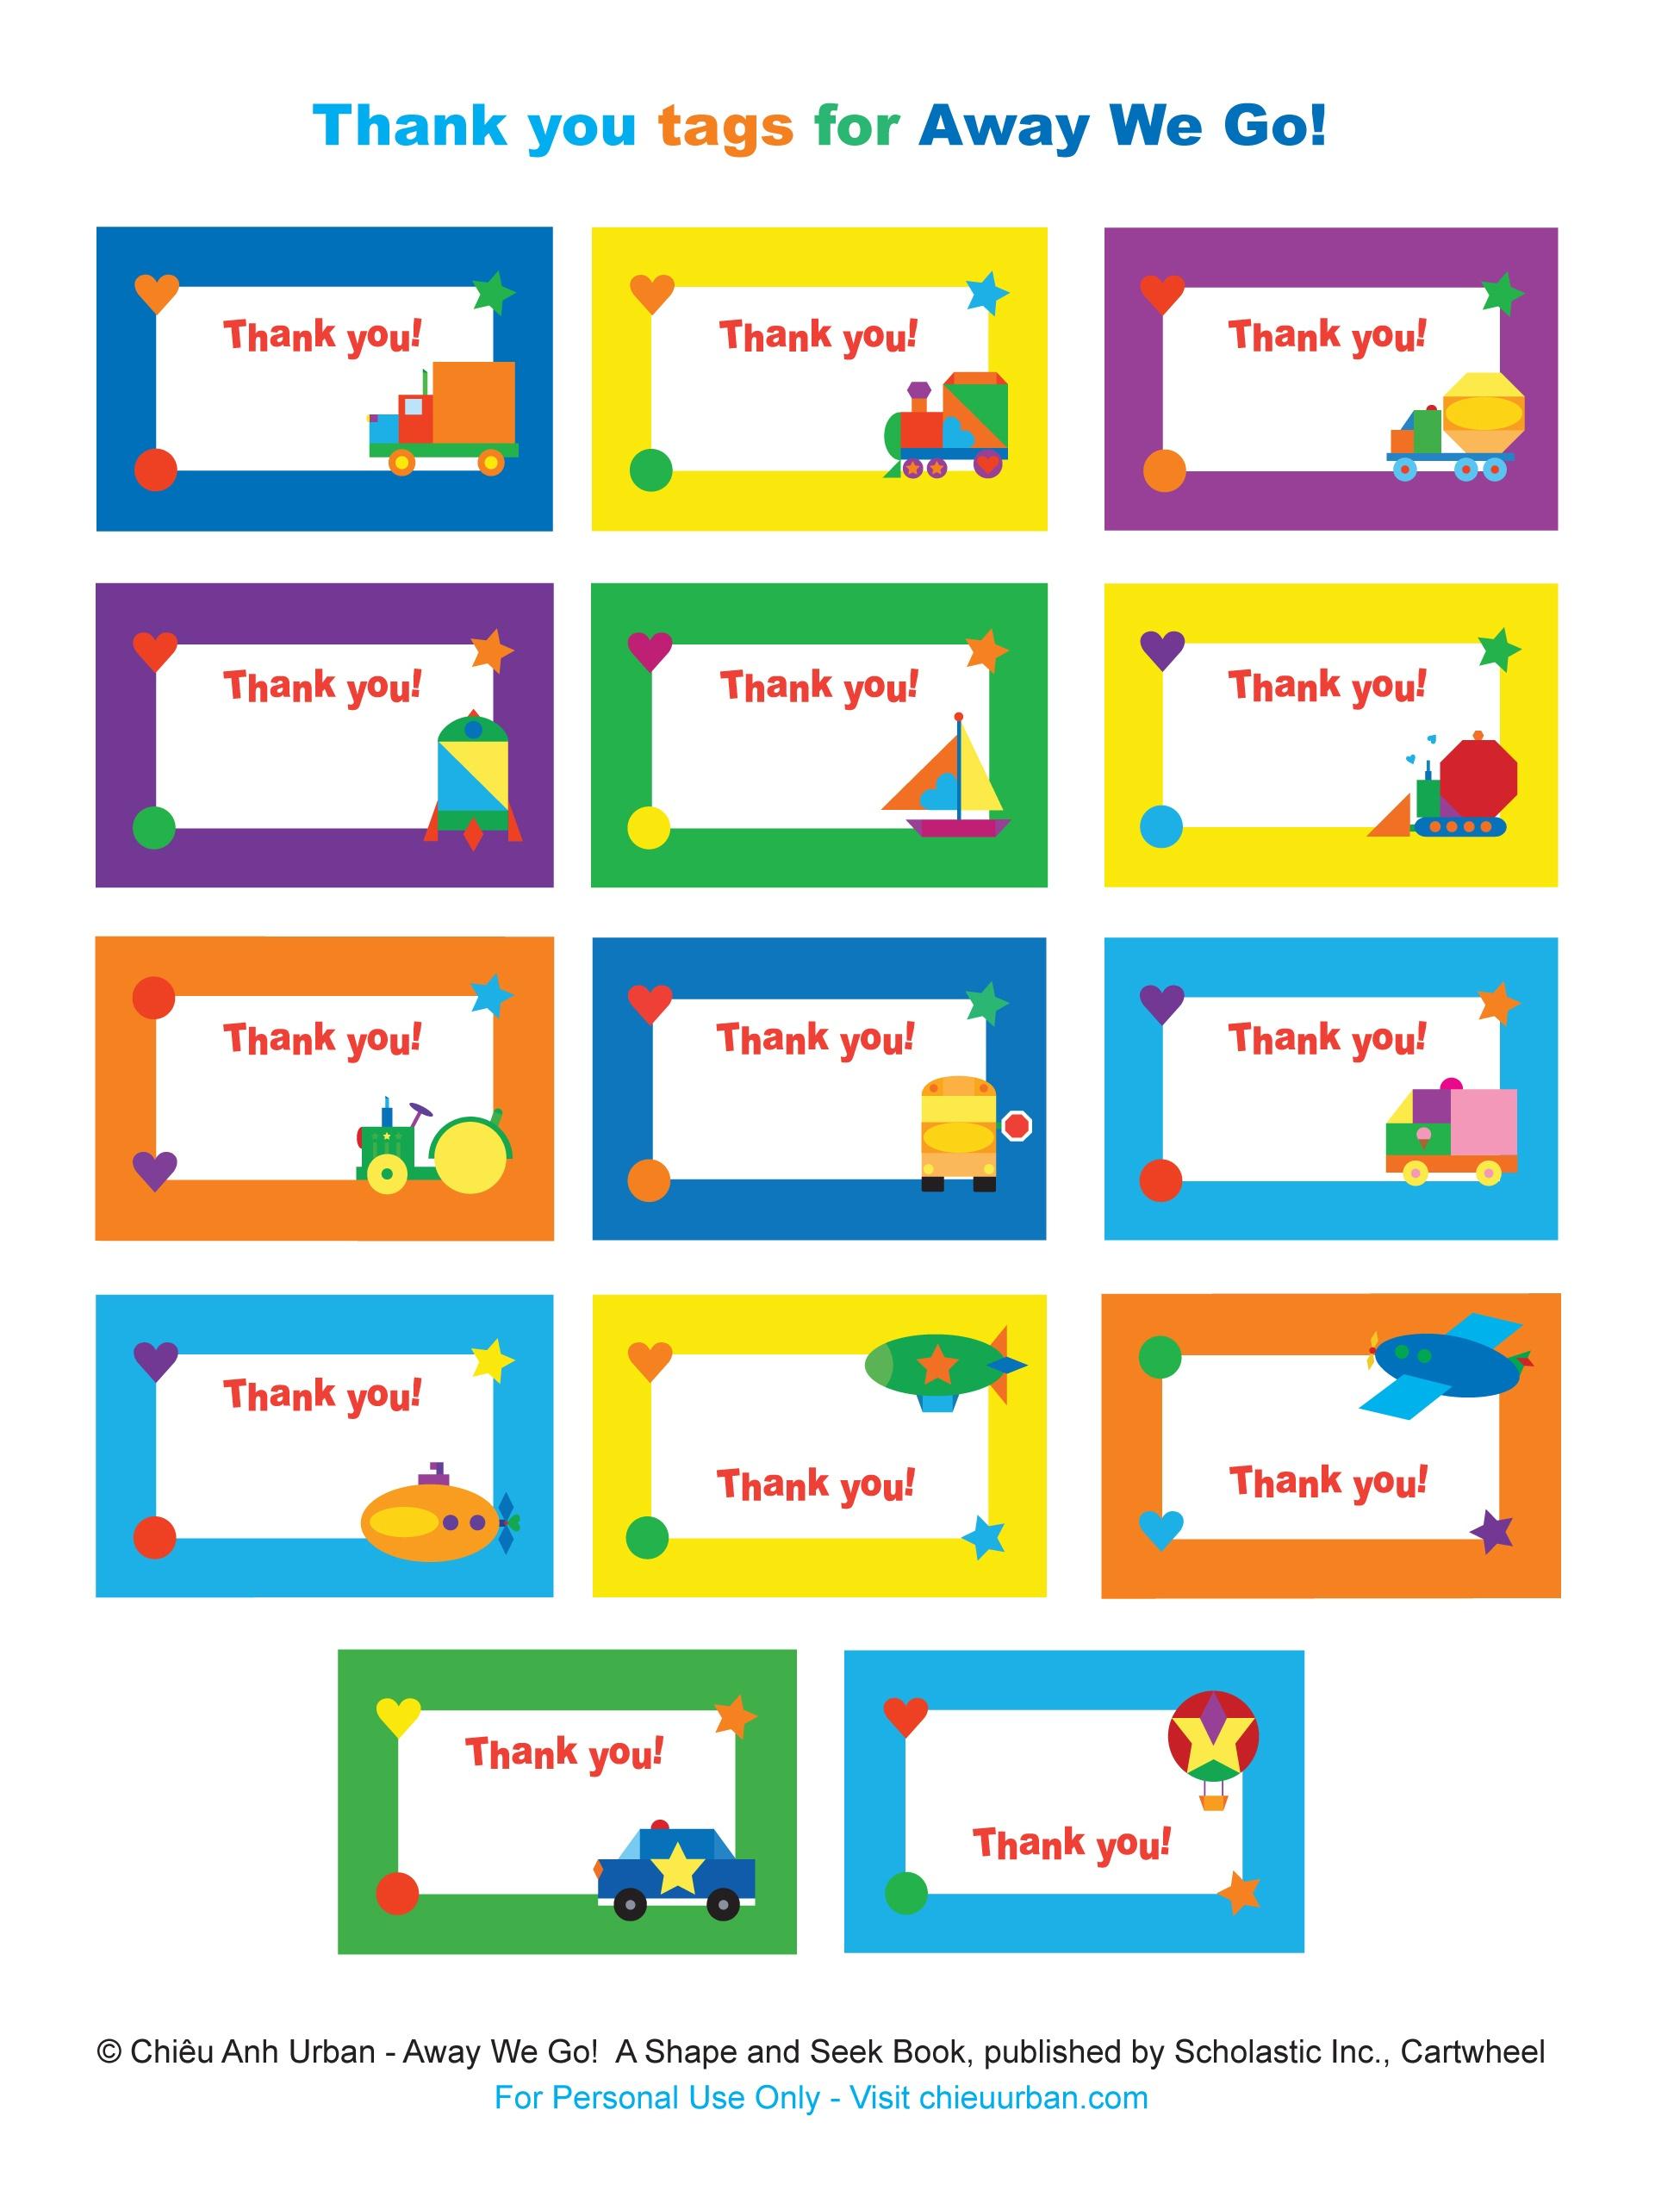 Free Printable Thank You Tags For Birthdays – Happy Holidays! - Free Printable Thank You Tags For Birthdays